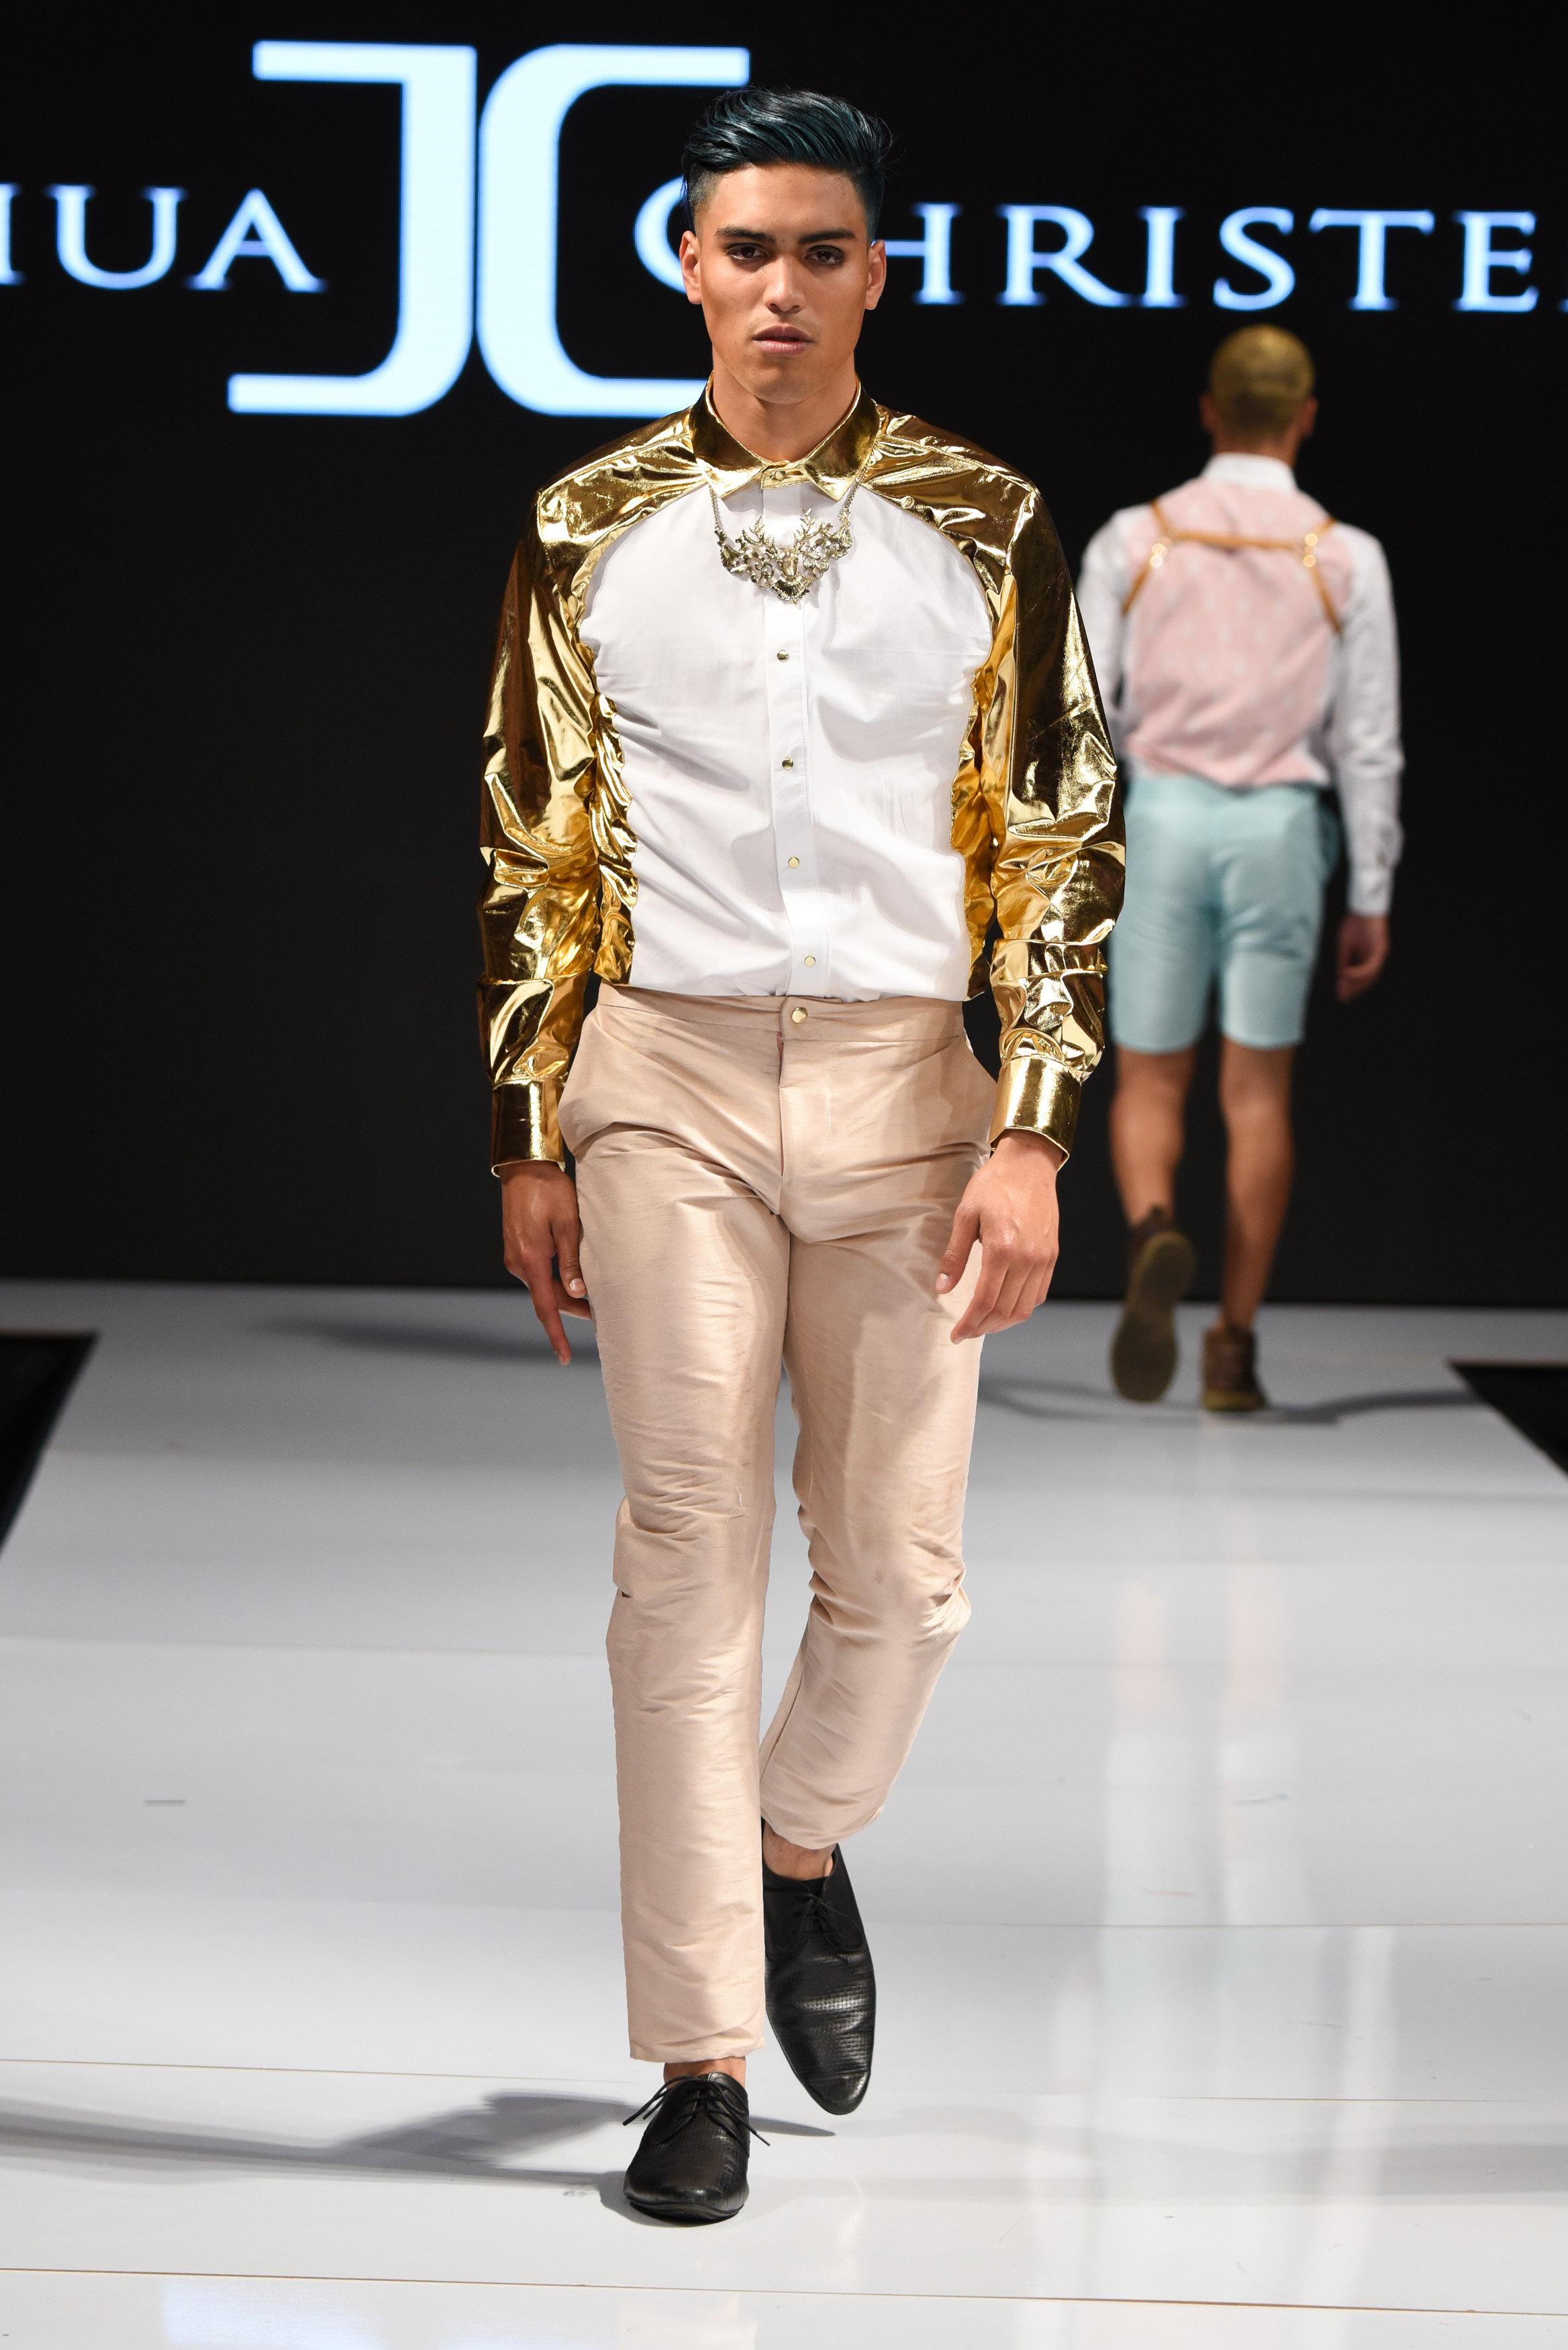 15 L A Fashion Designers You Should Know